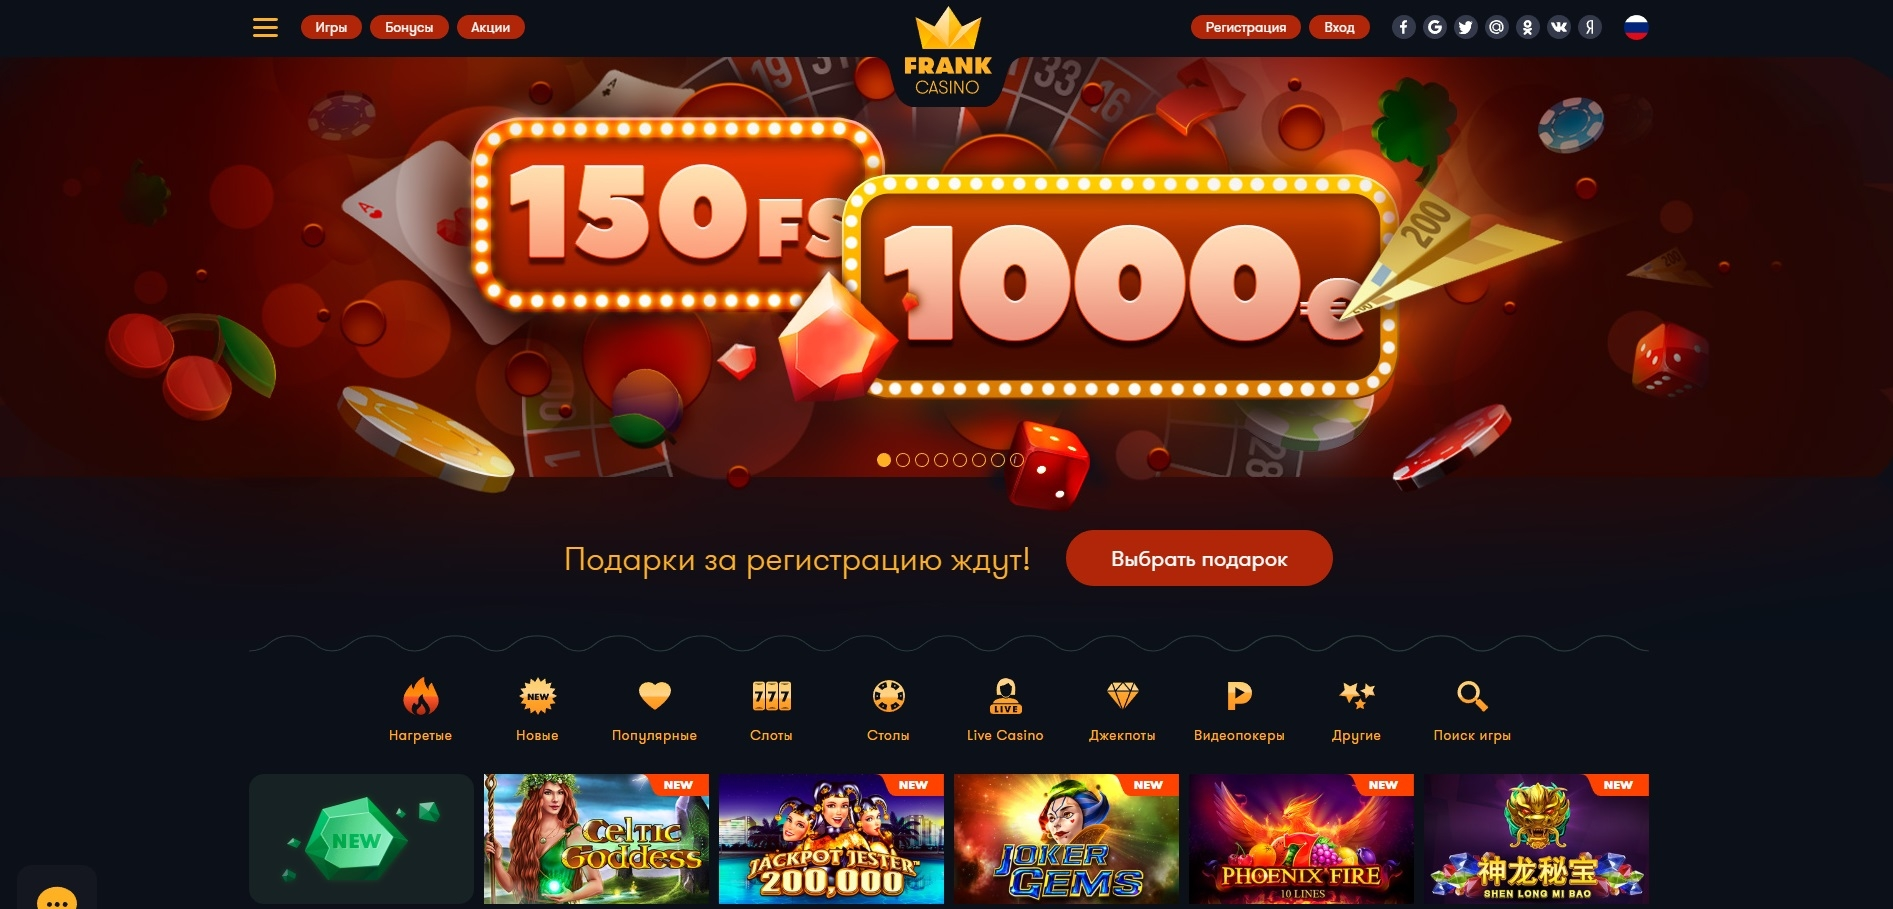 обзор онлайн казино frank casino